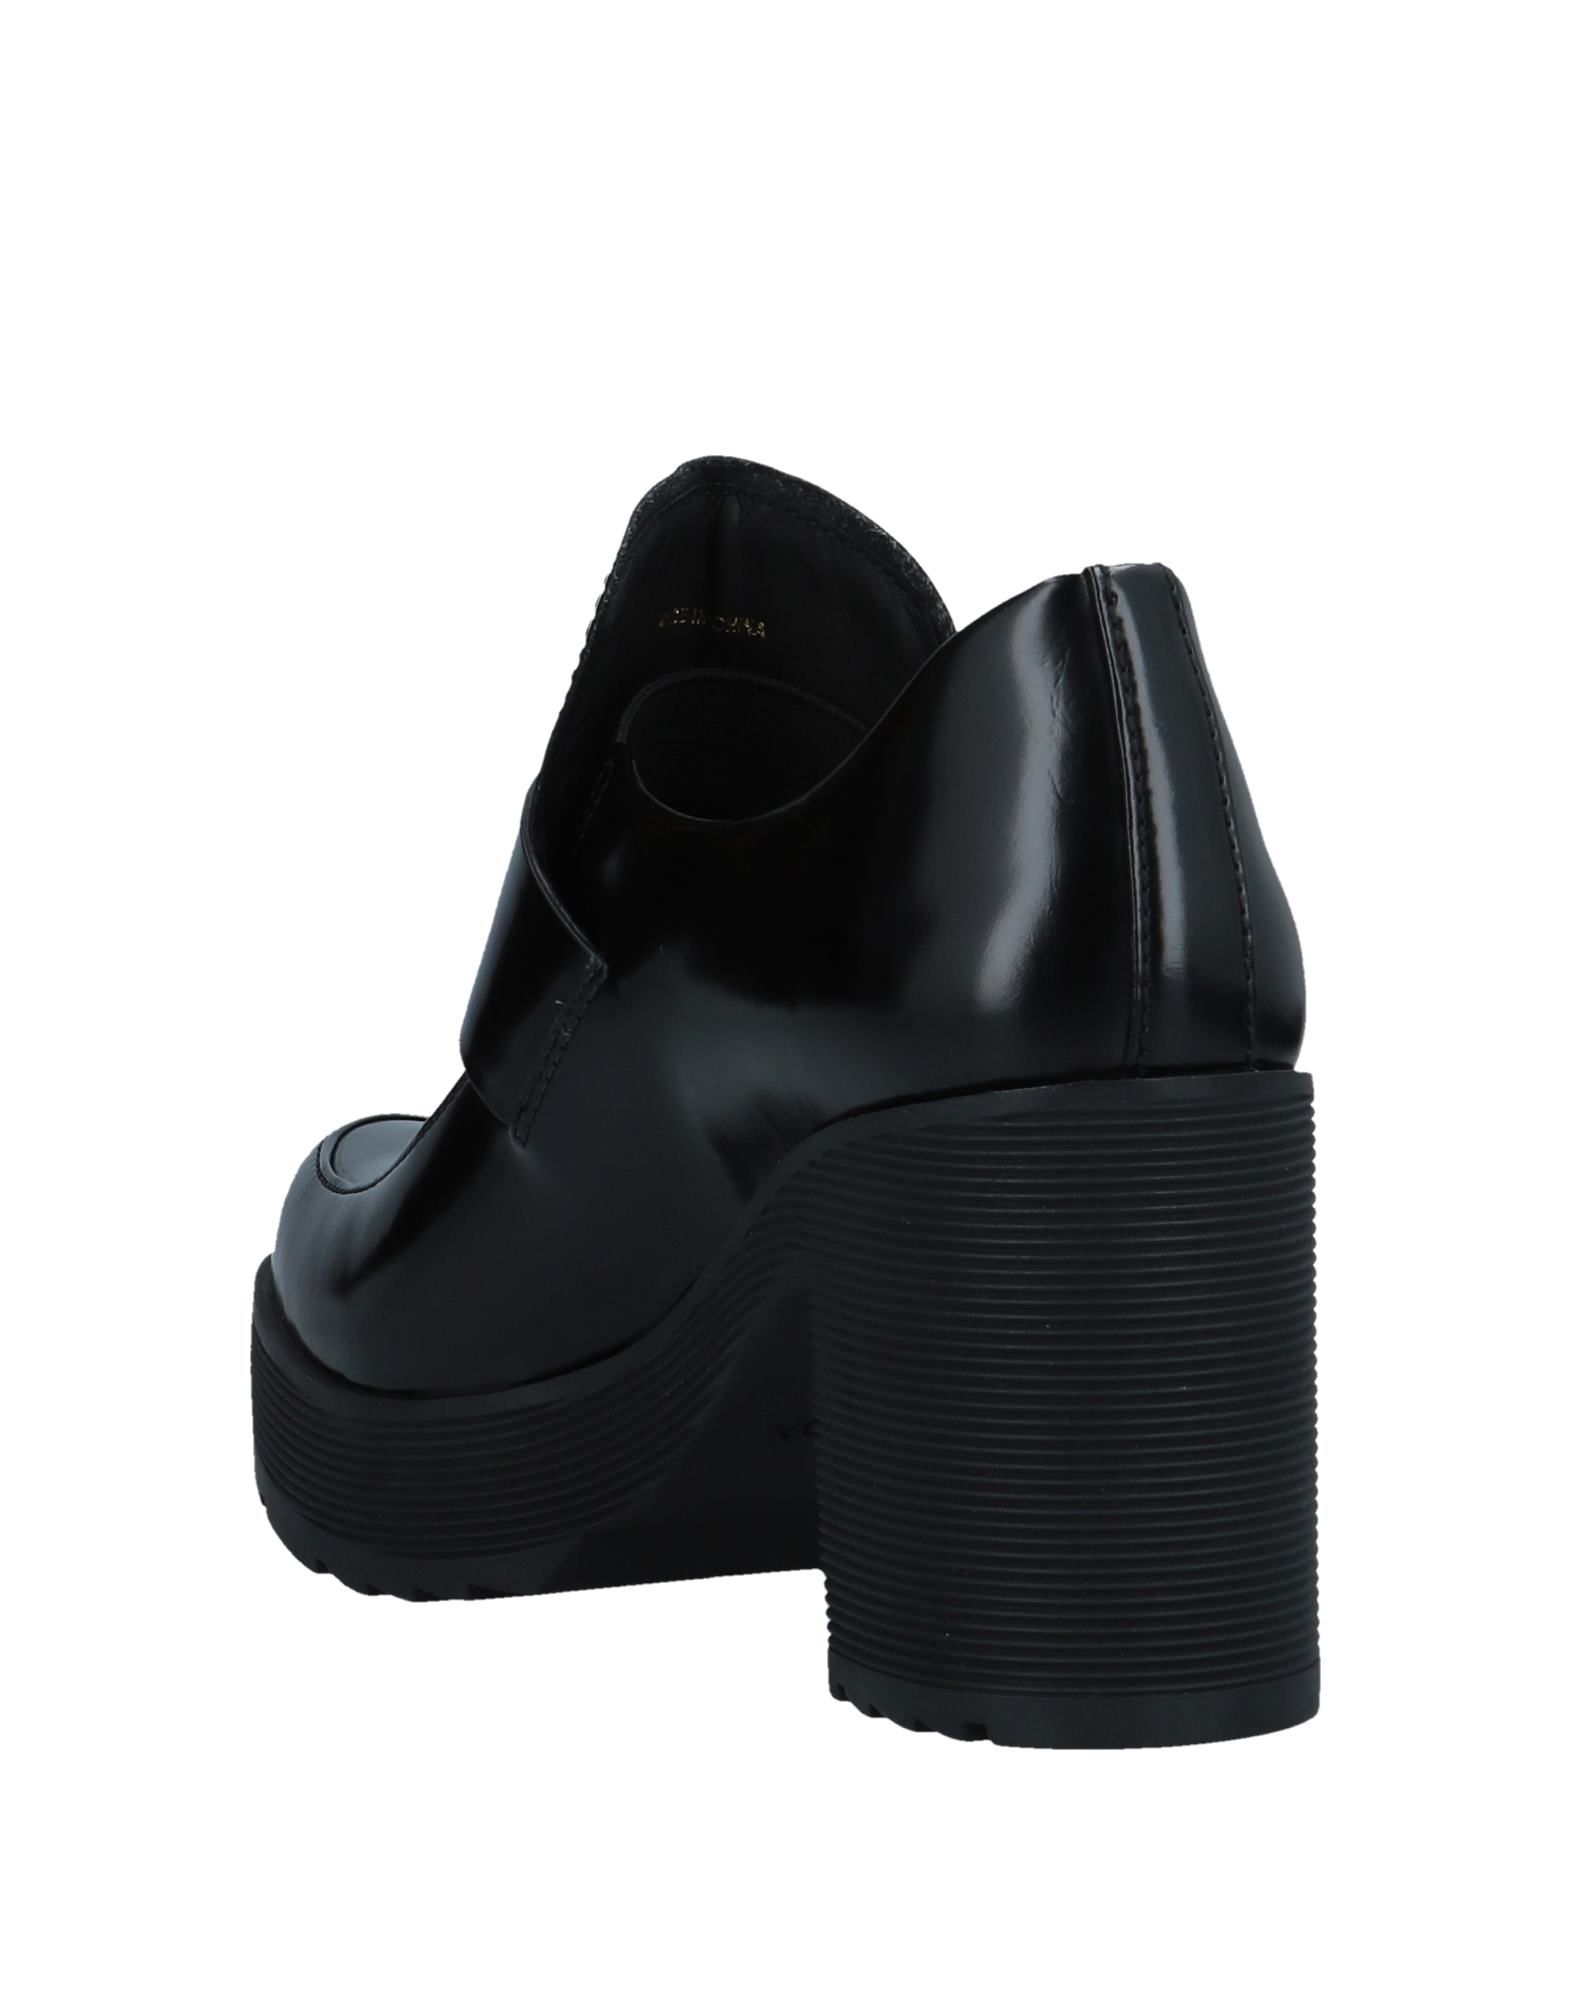 Prada Sport Mokassins Damen aussehende  11551026JKGünstige gut aussehende Damen Schuhe 78f707